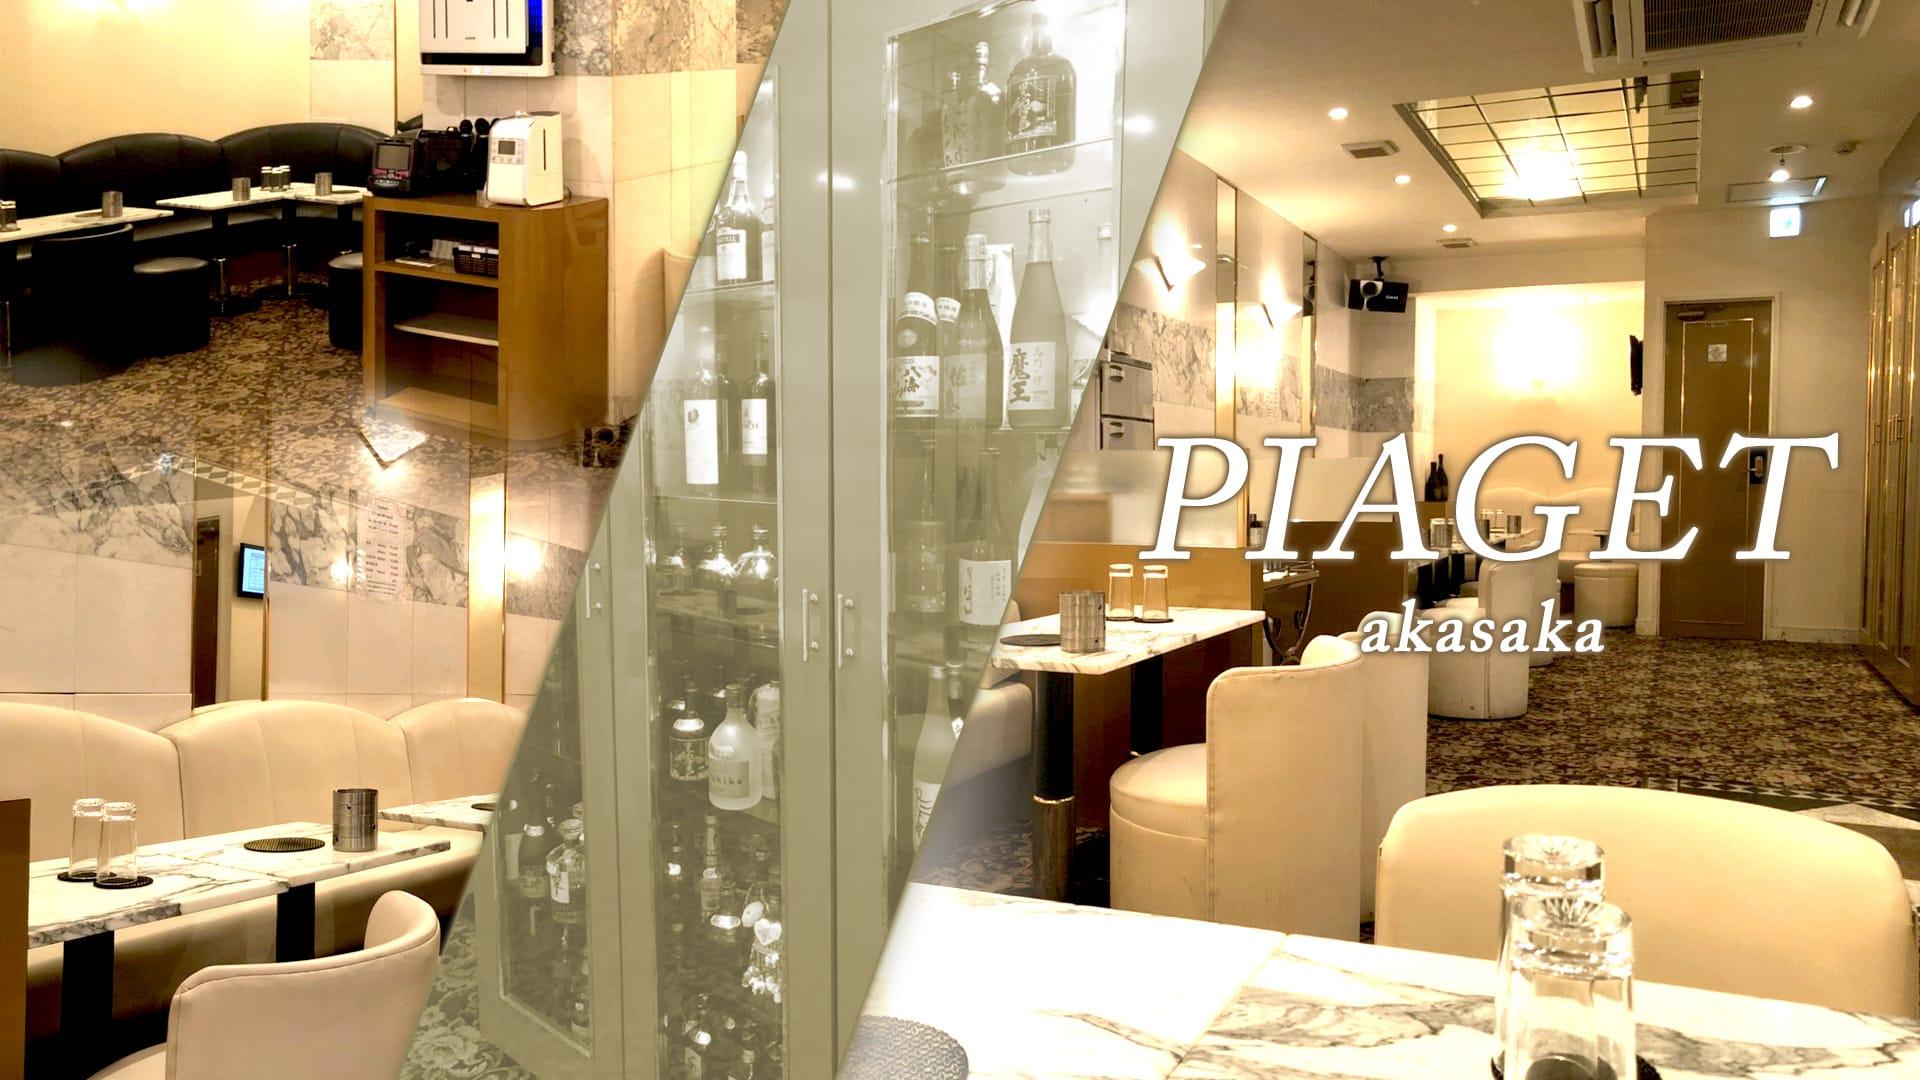 PIAGET[ピアジェ] 赤坂 キャバクラ TOP画像